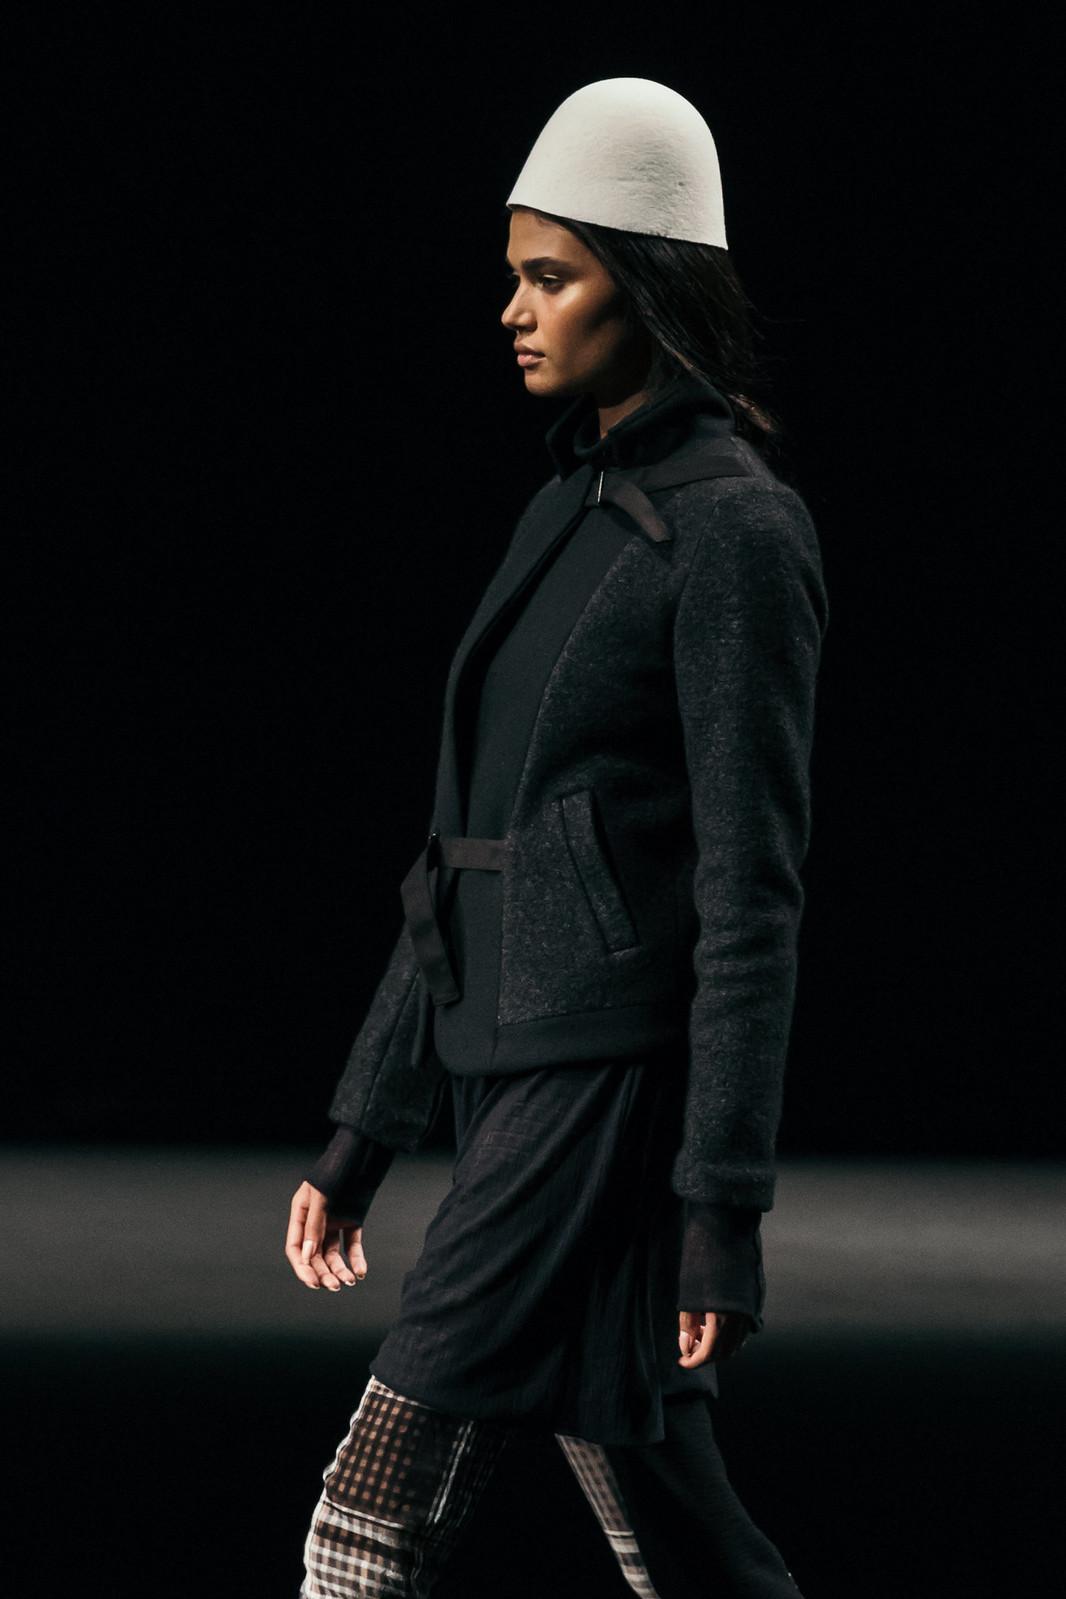 Jessie Chanes - Seams for a desire - 080 Bacelona Fashion #080bcnfasion -24